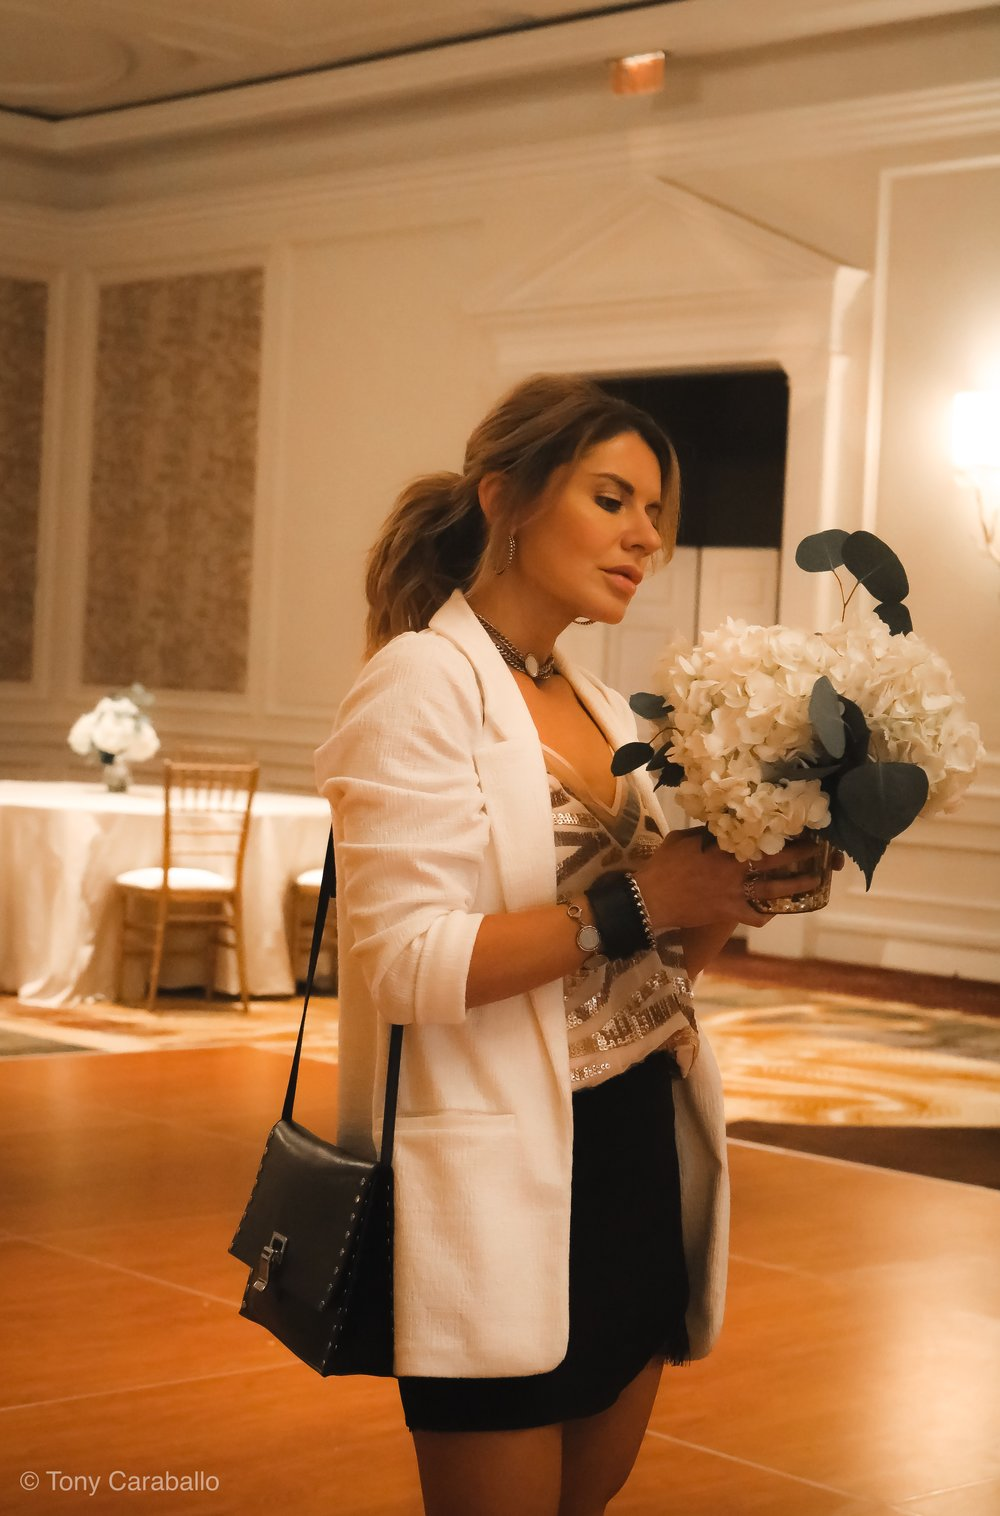 Ritz Carlton Tysons Corner Isabel Alexander holding a bouquet